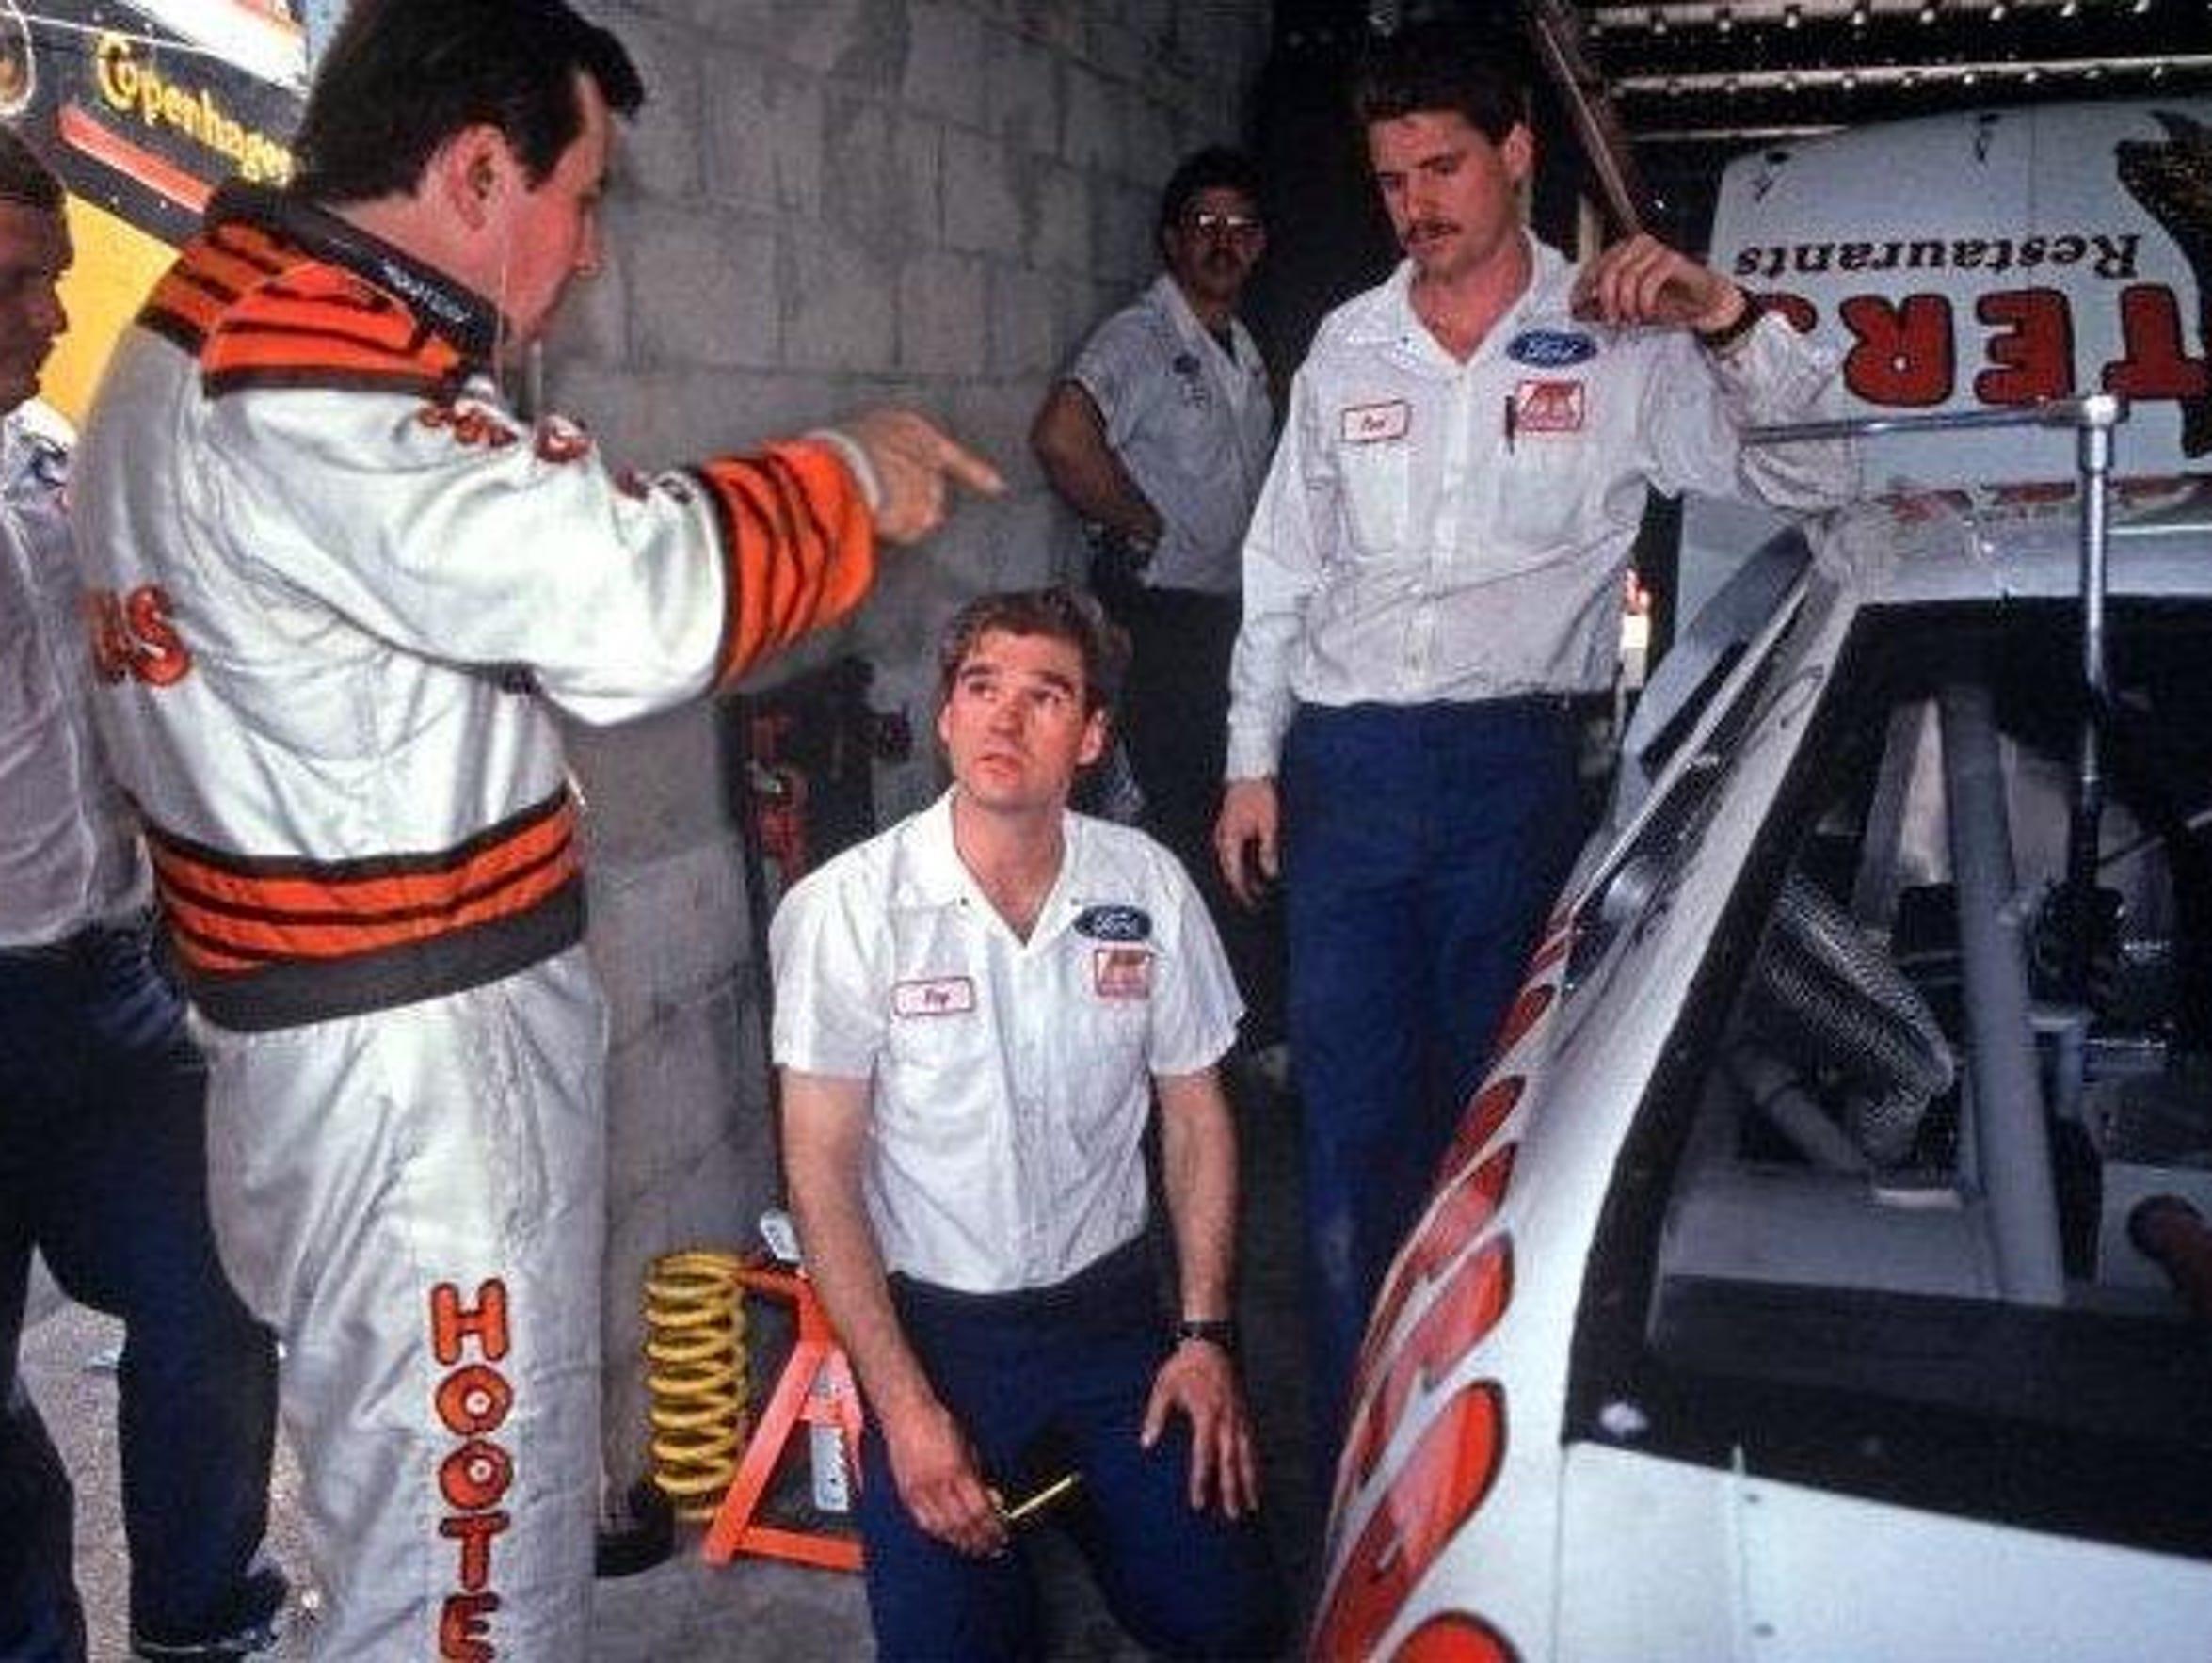 Alan Kulwicki tells Ray Evernham (kneeling) and crew